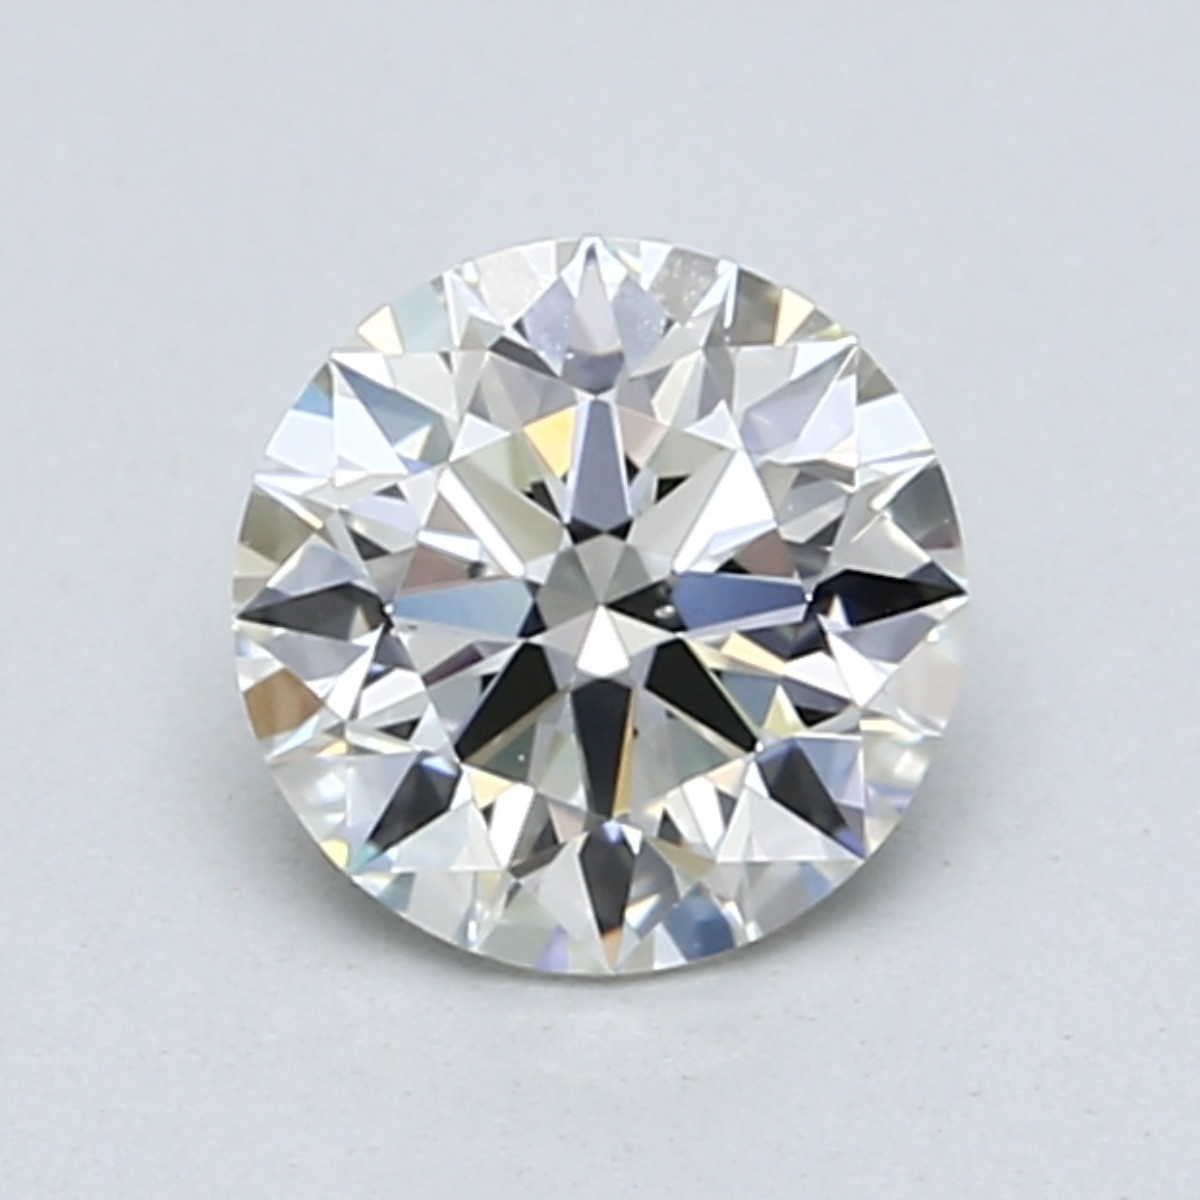 2 Carat D Color Diamond Facing Up White